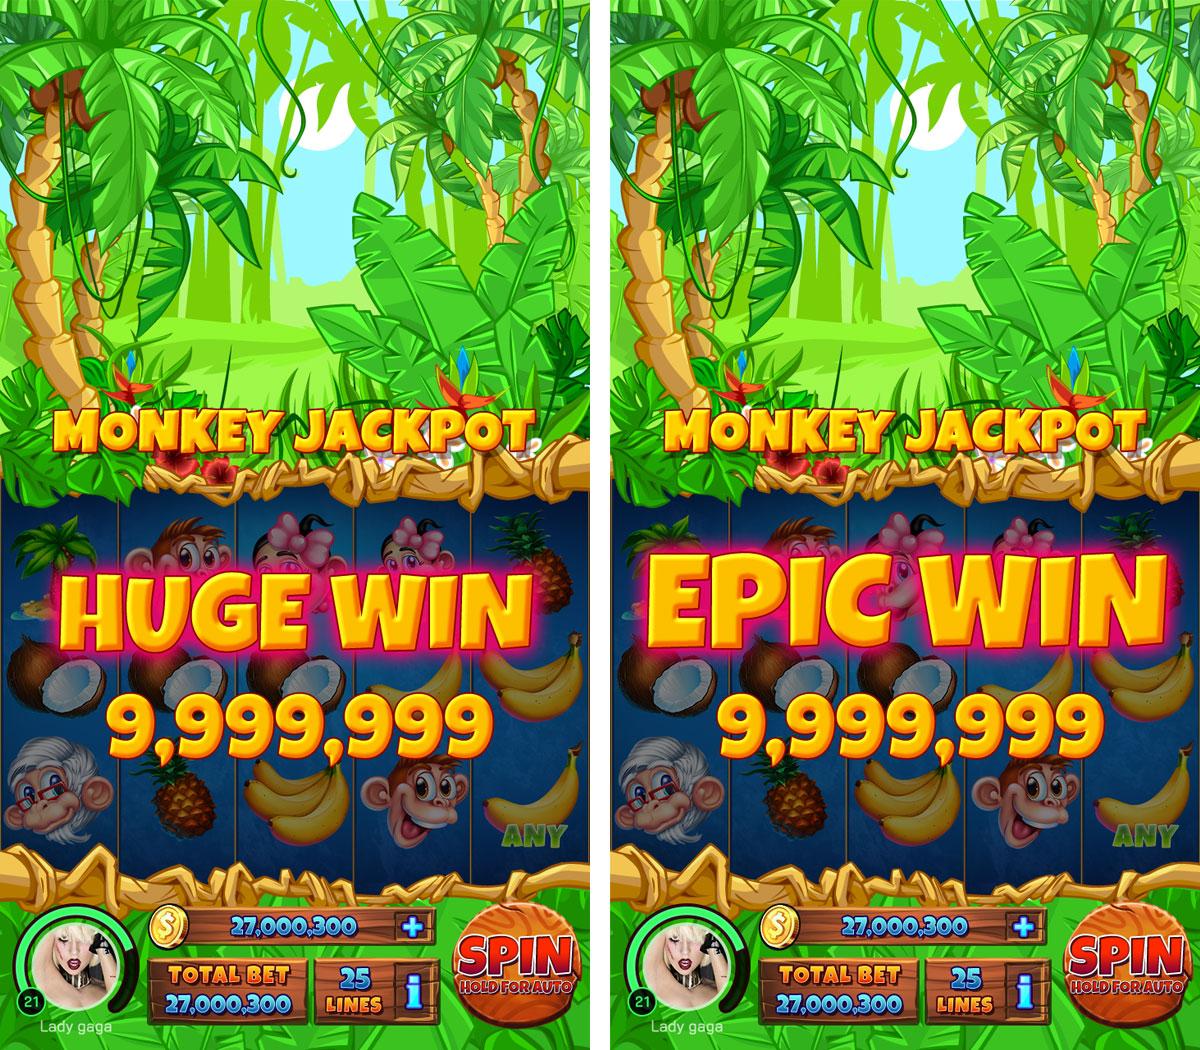 monkey_jackpot_blog_win-3